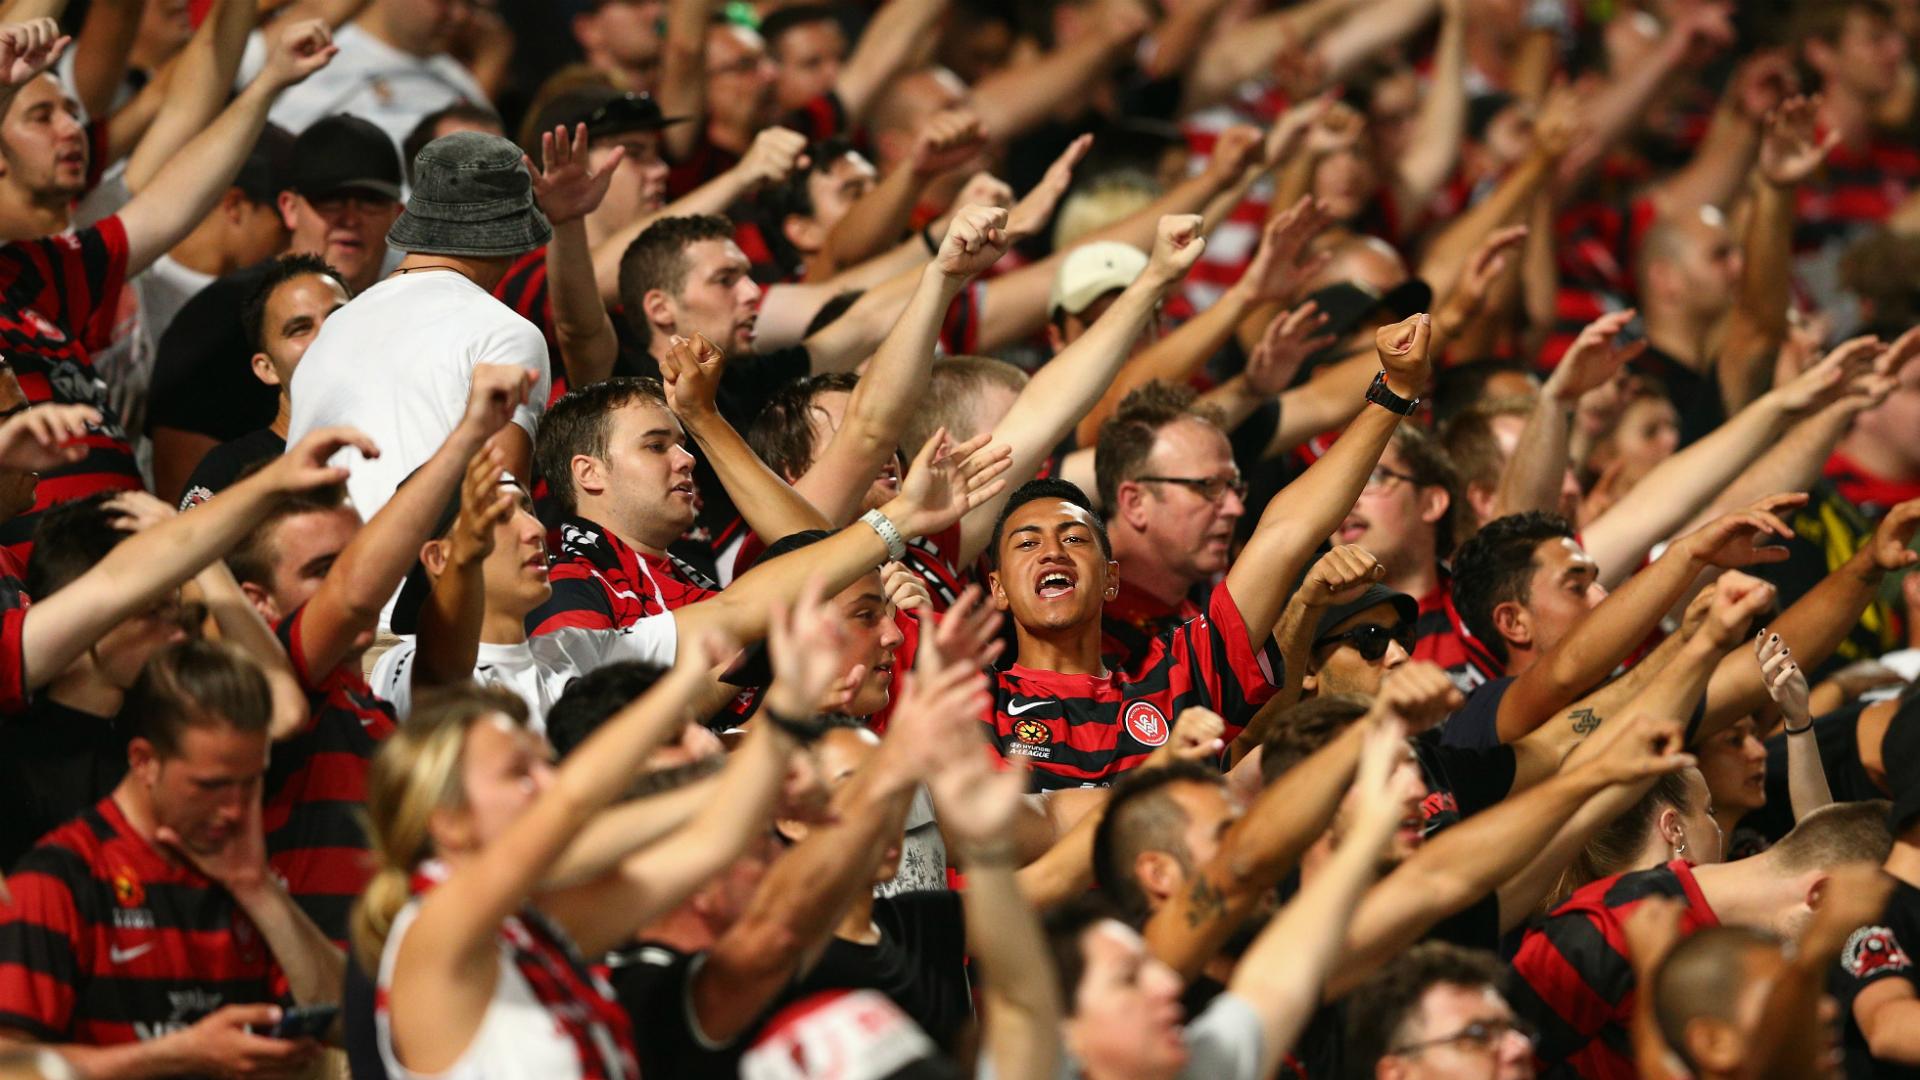 Western Sydney Wanderers v Guangzhou Evergrande AFC Champions League 04032015